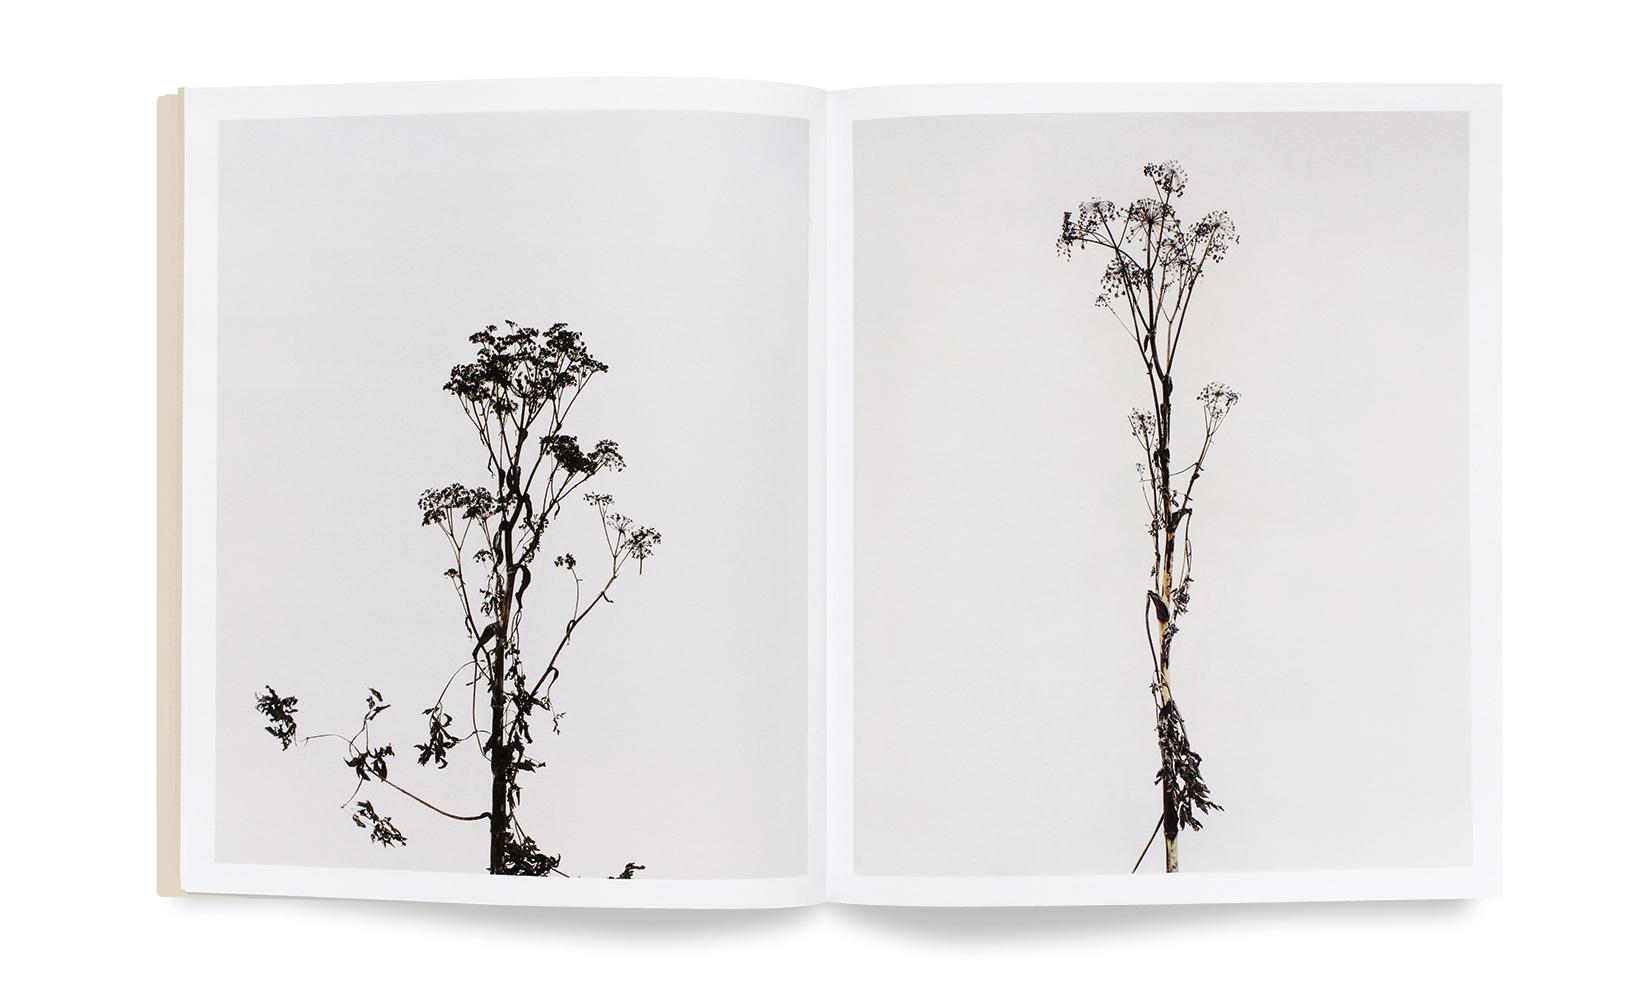 versailles-visible-invisible-toluca-studio-olivier-andreotti-POITEVIN-4.jpg